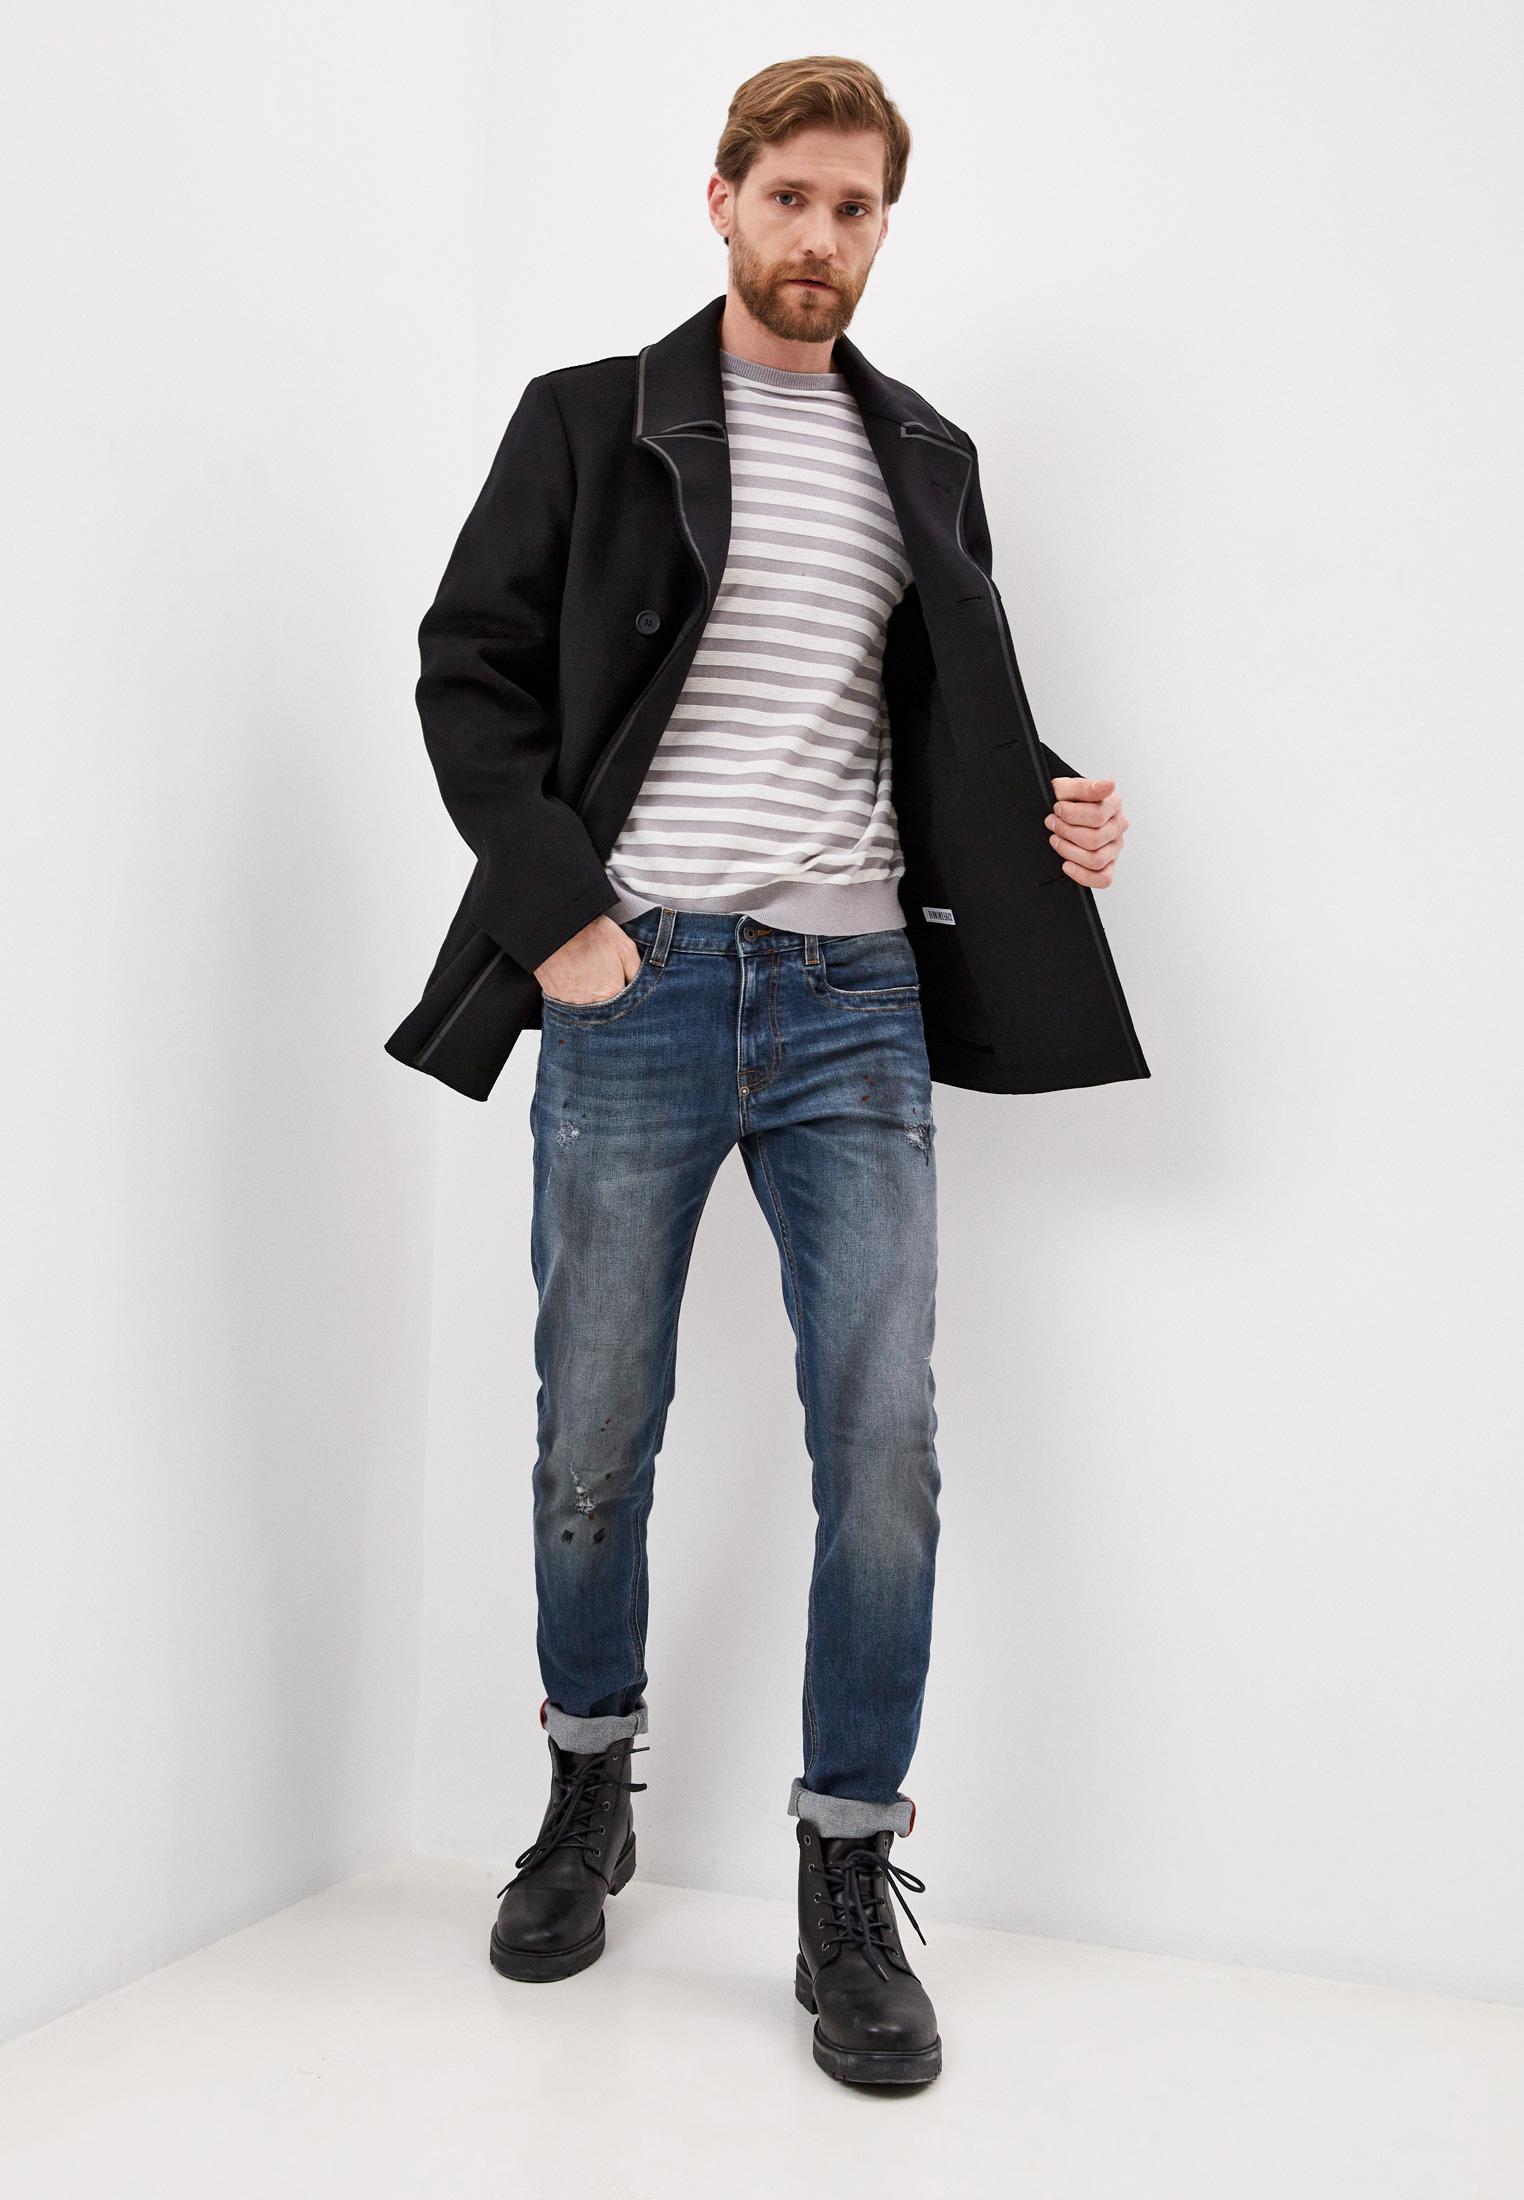 Мужское пальто Bikkembergs (Биккембергс) C J 005 01 T 9220: изображение 3